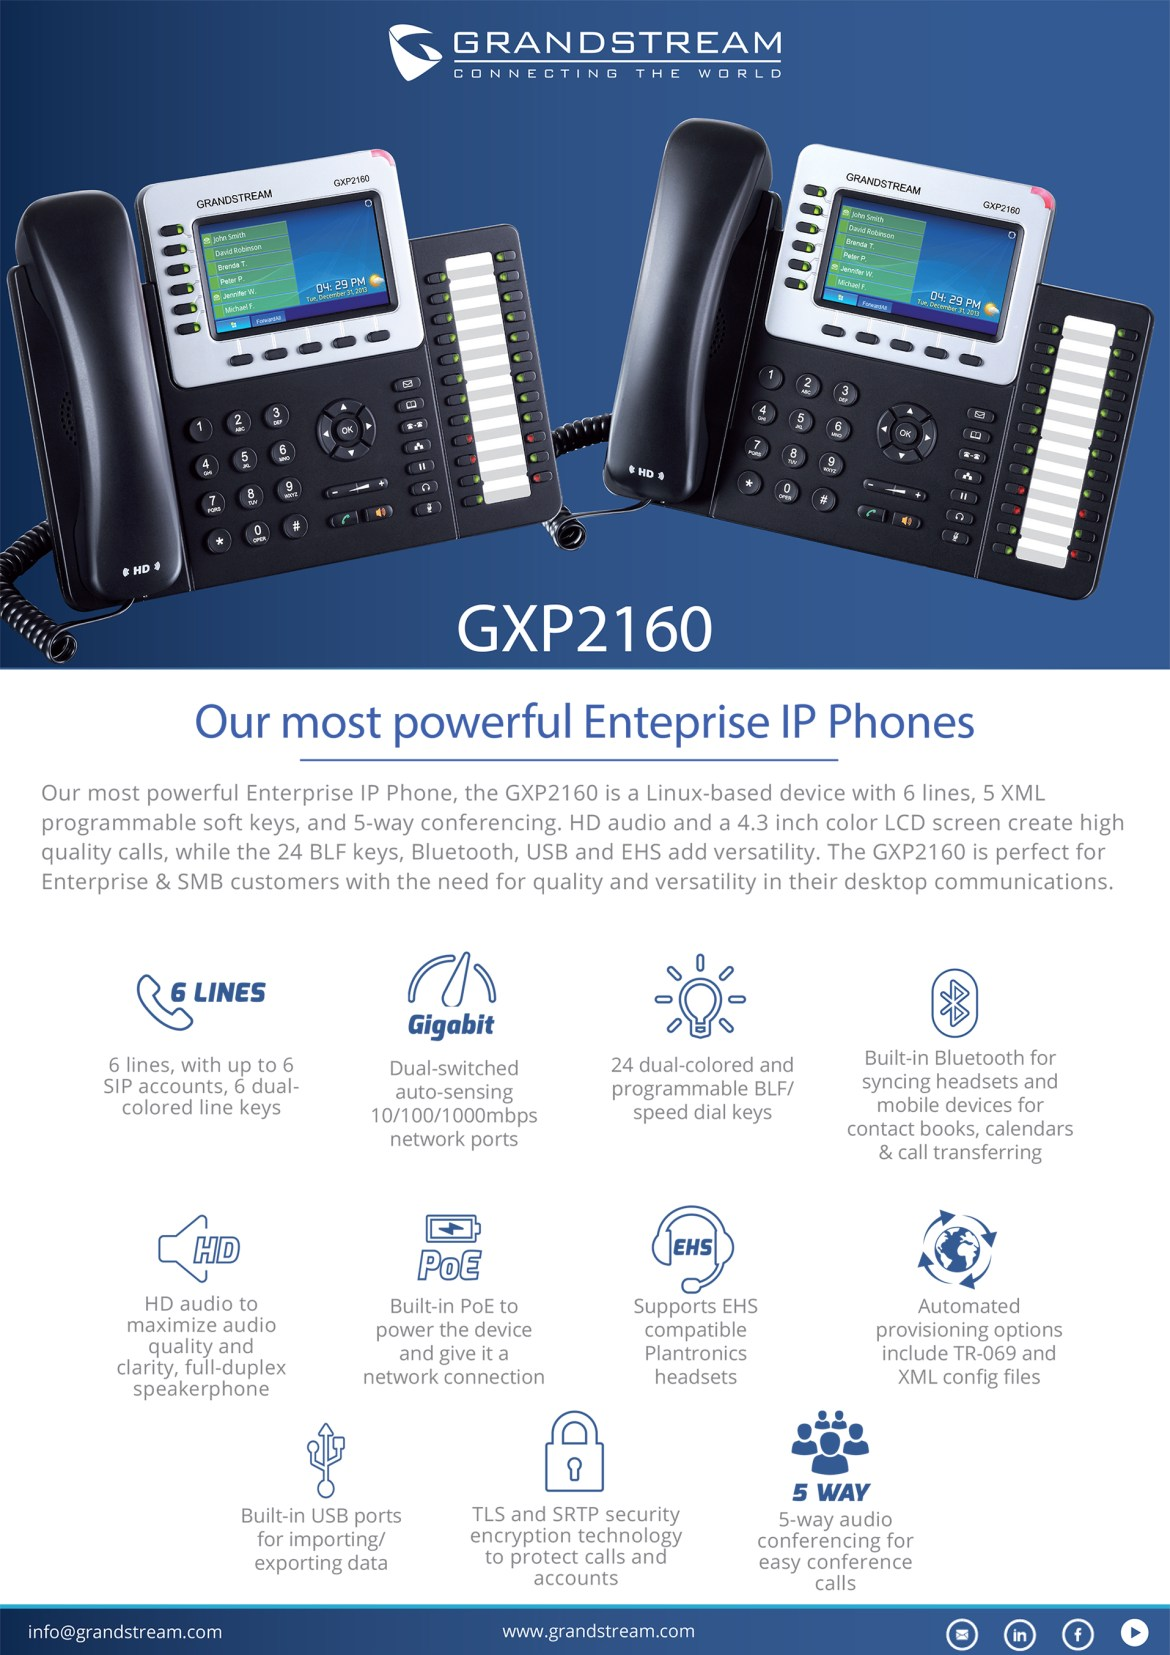 gxp2160 datasheet